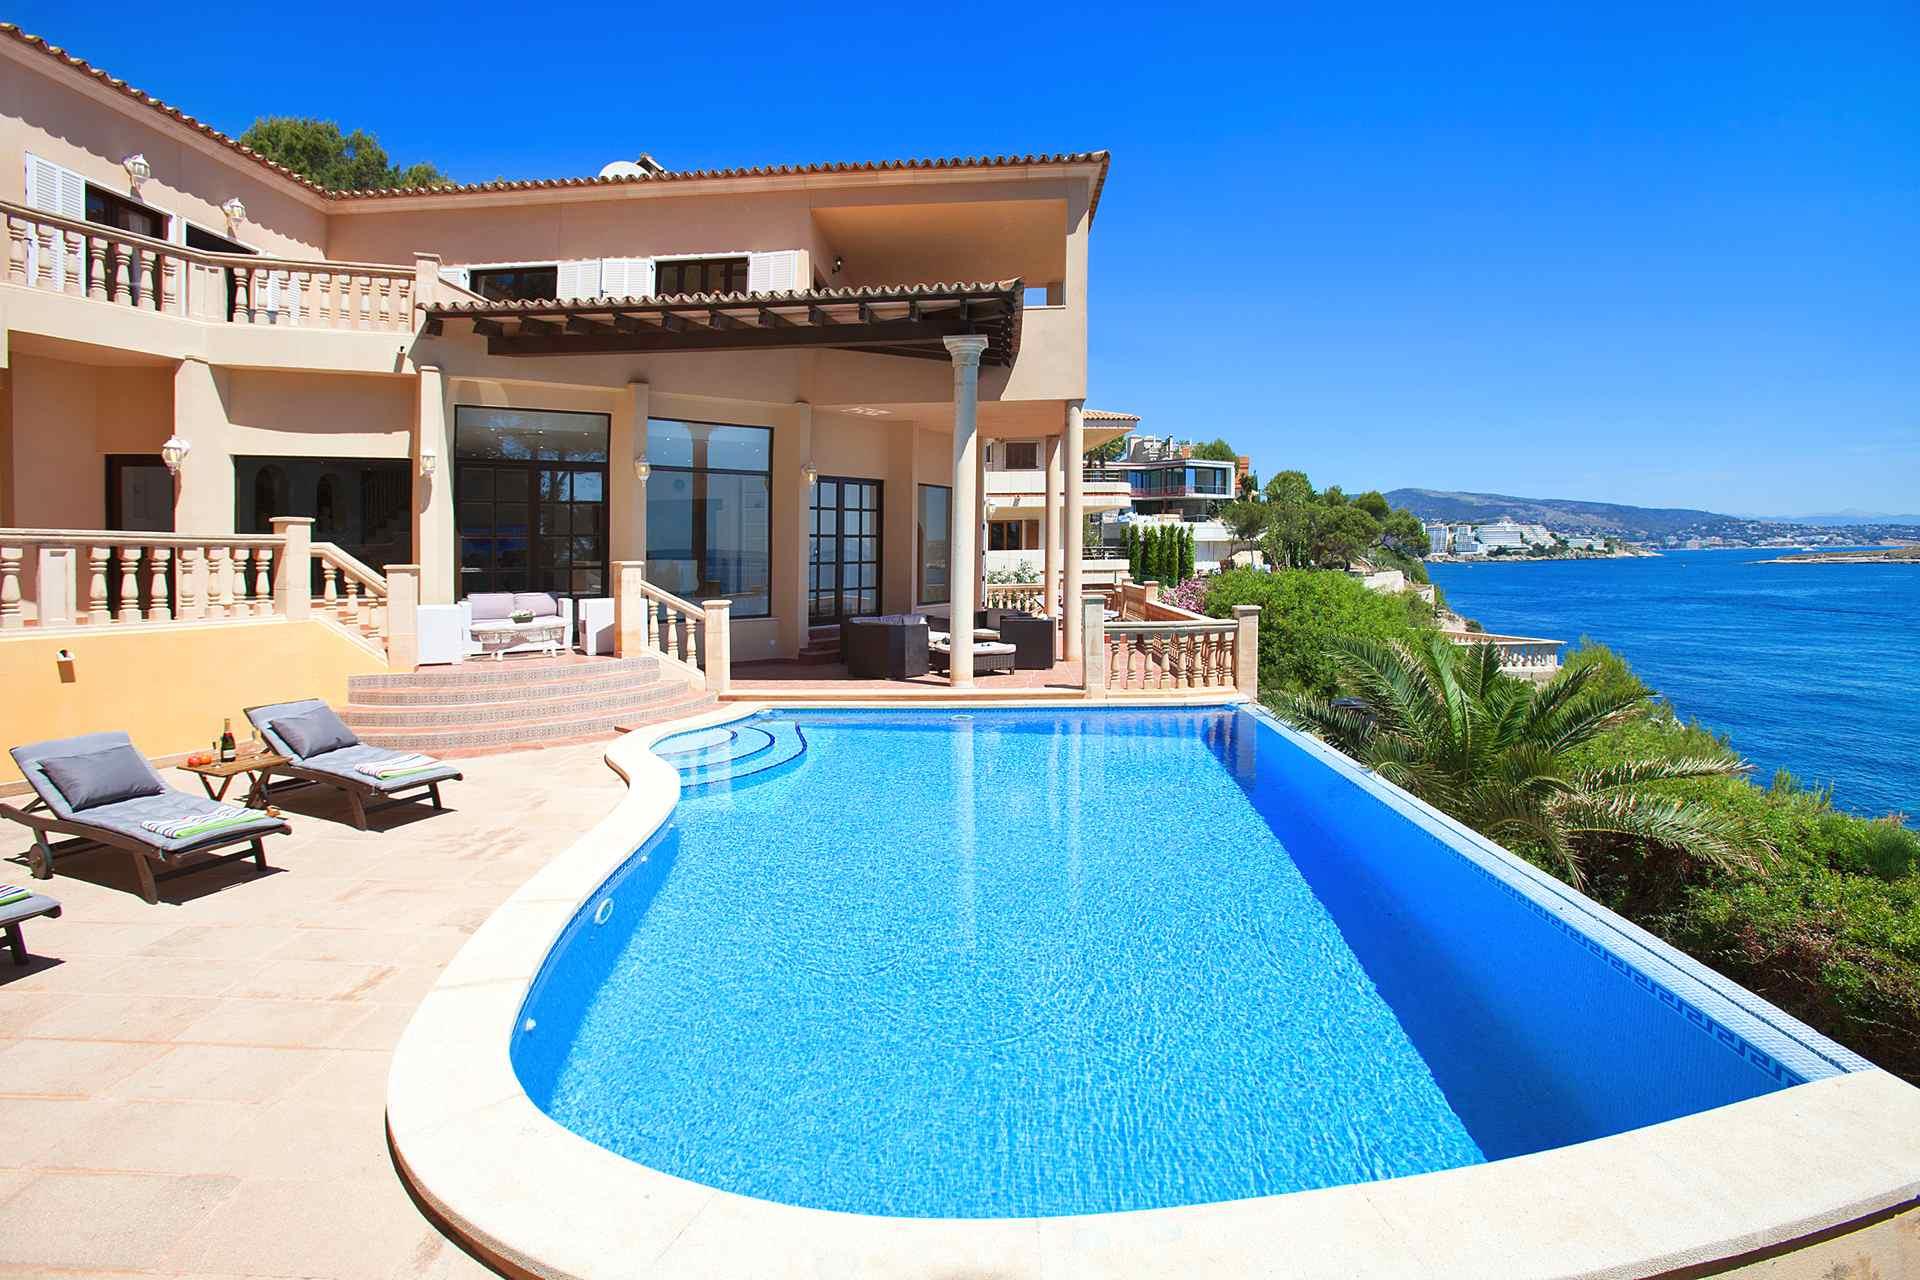 01-23 Villa Mallorca Südwesten mit Meerblick Bild 3